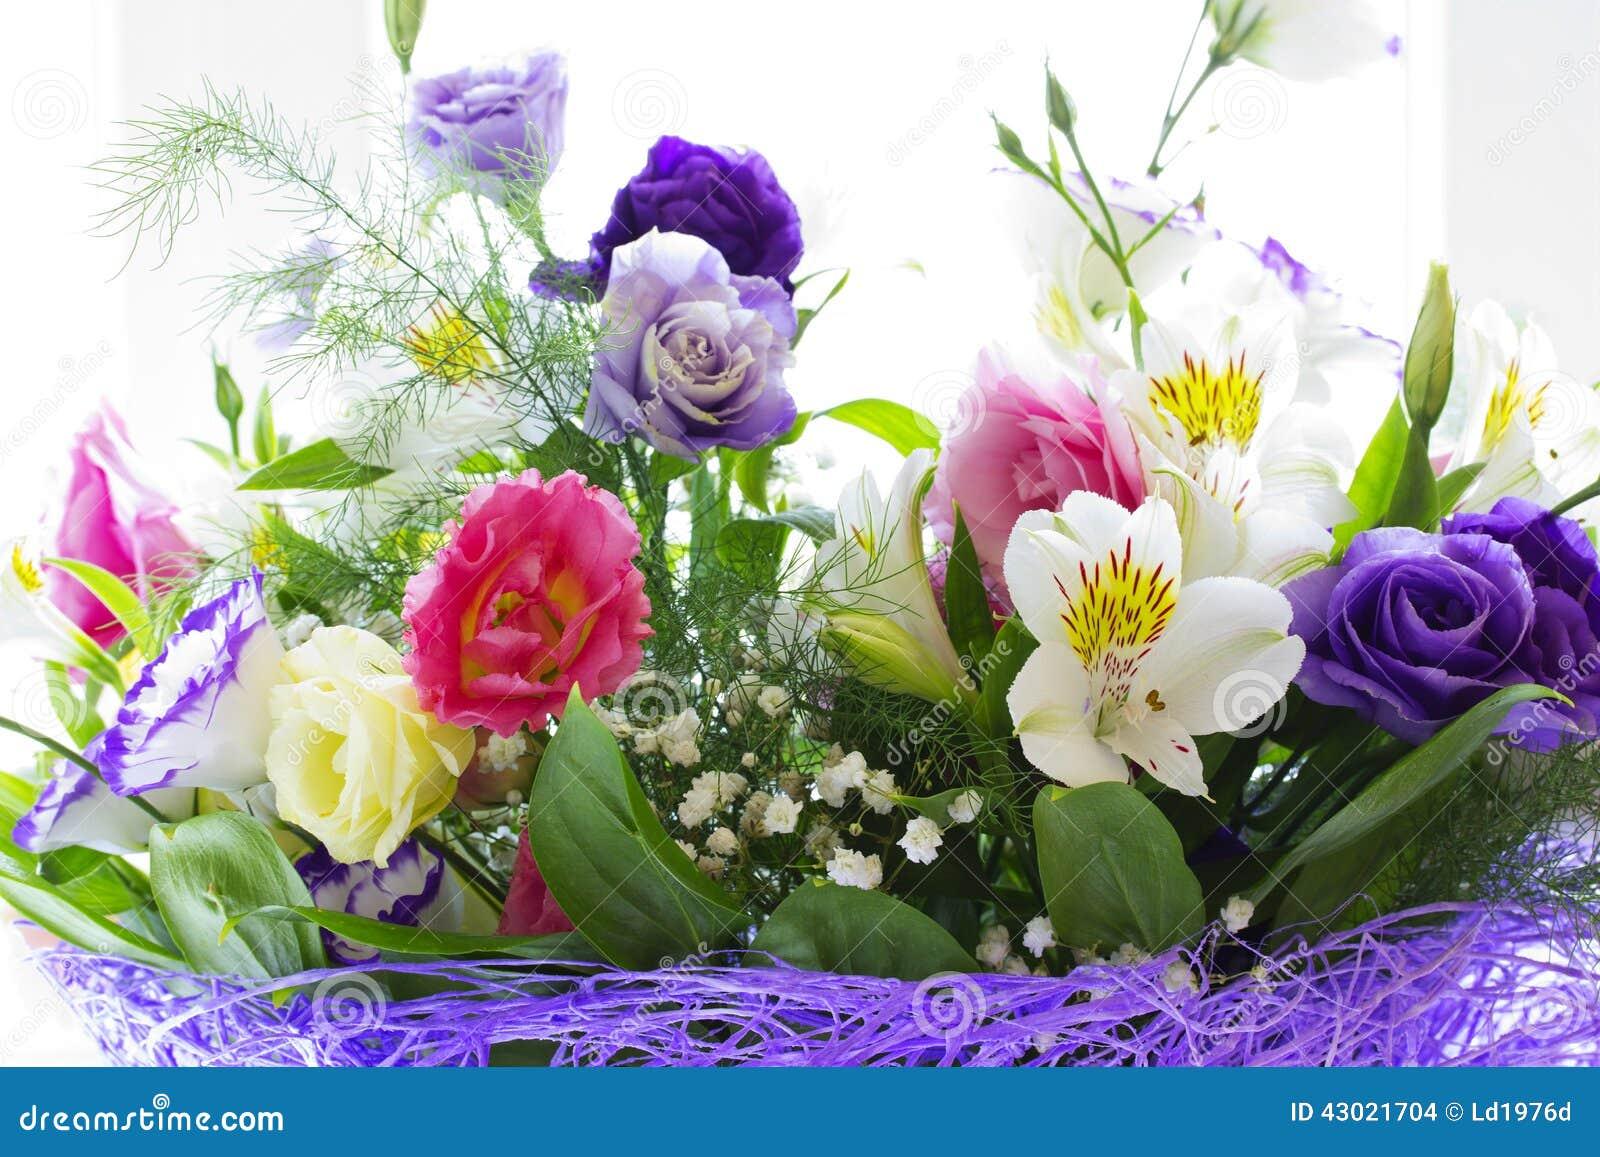 Beautiful spring flowers stock photo image of bouquet 43021704 beautiful spring flowers izmirmasajfo